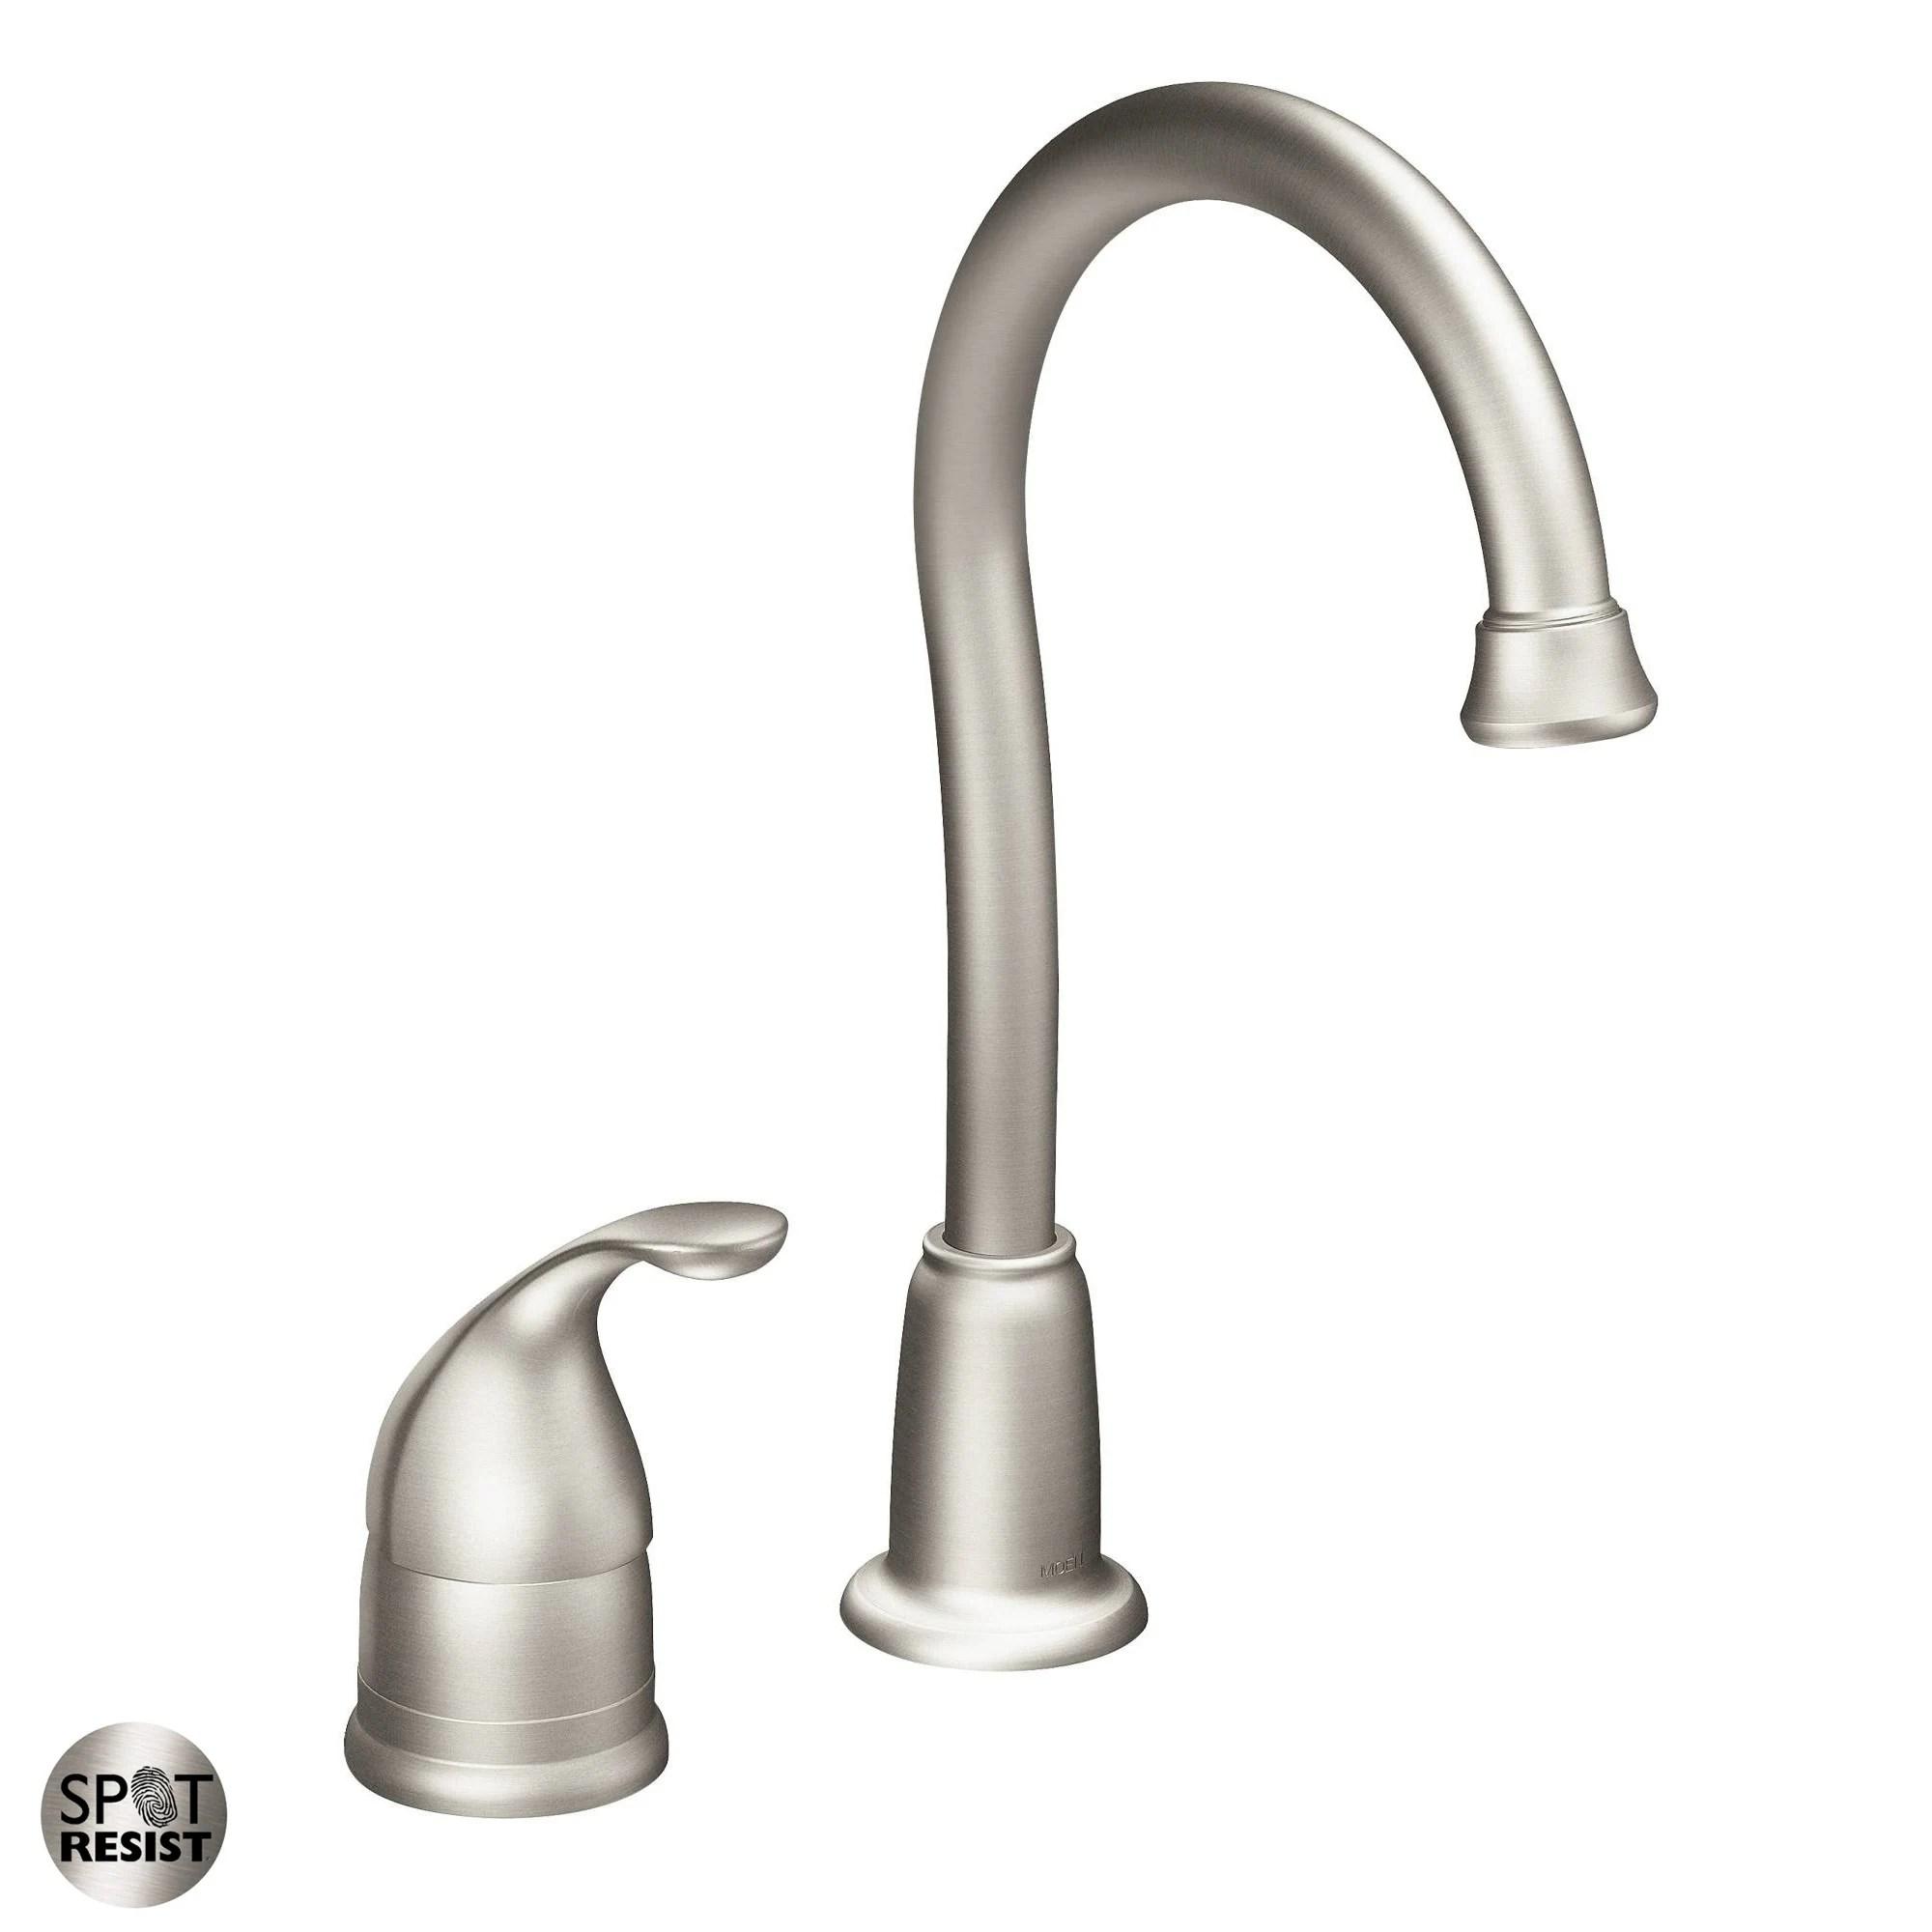 moen 4905 camerist single handle bar faucet